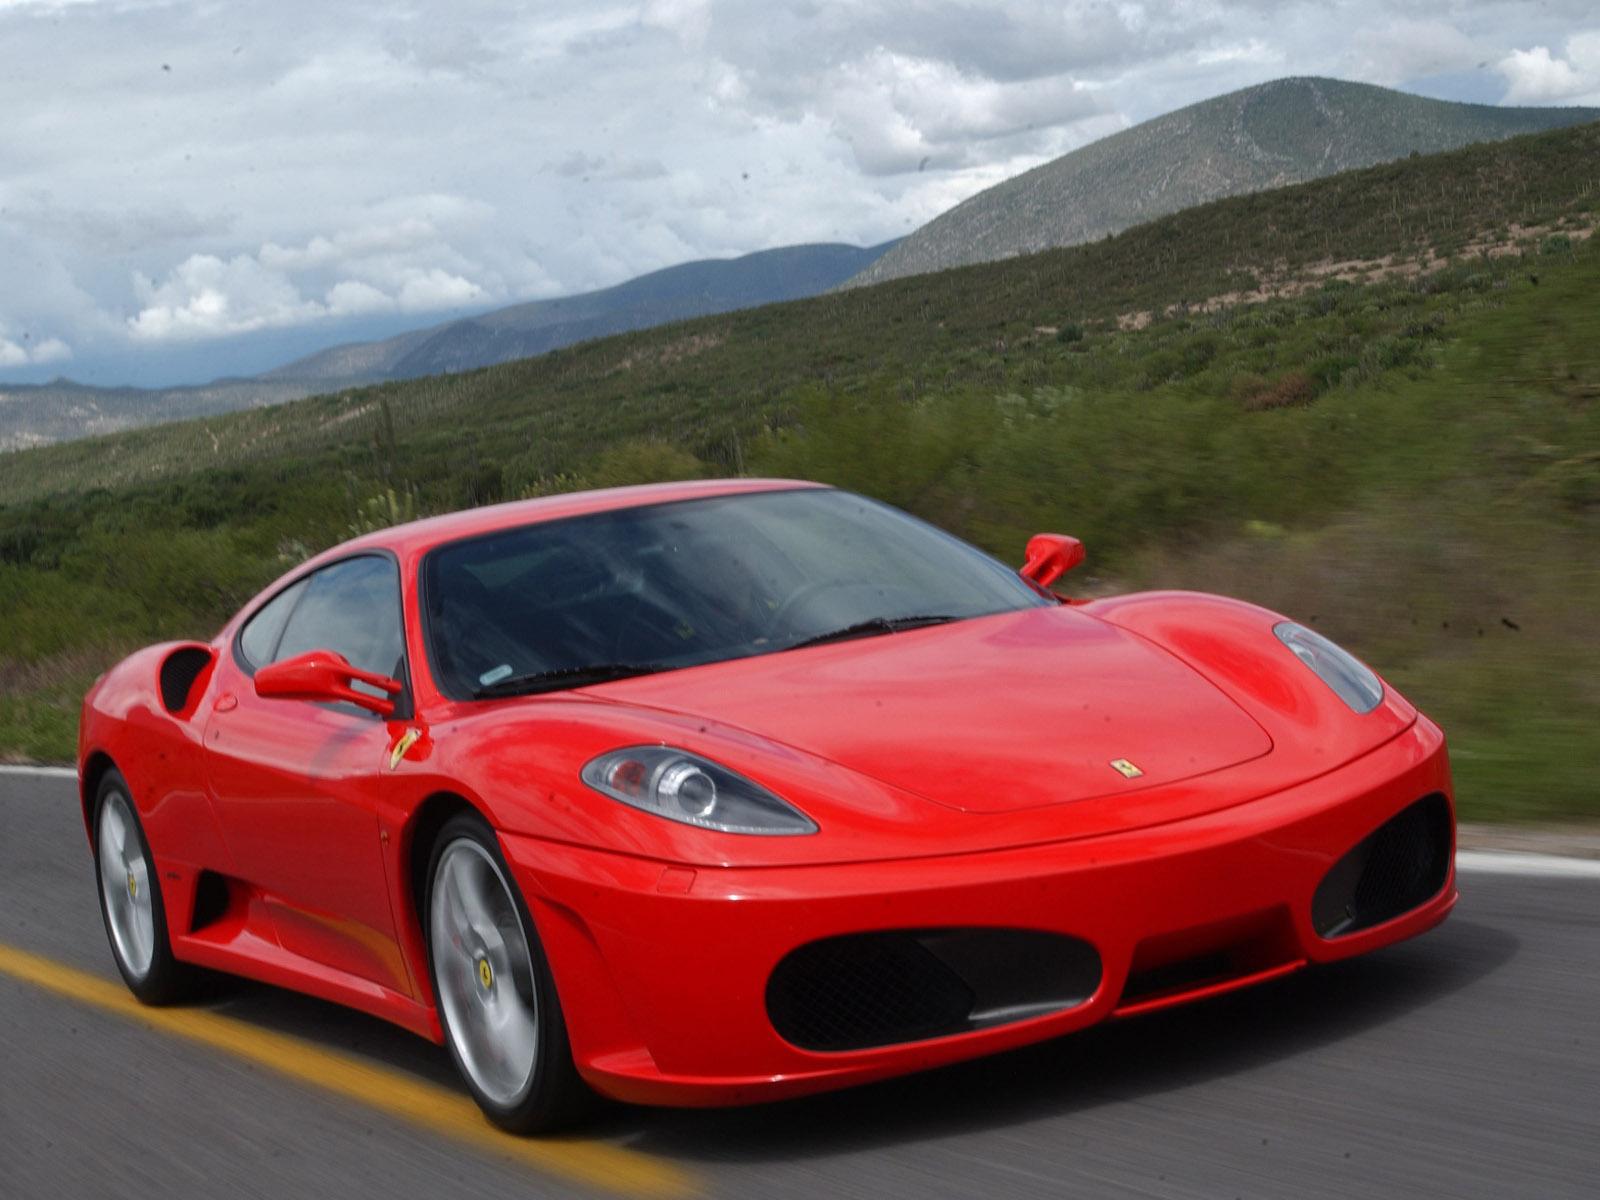 Ferrari Cars 17 Cool Hd Wallpaper